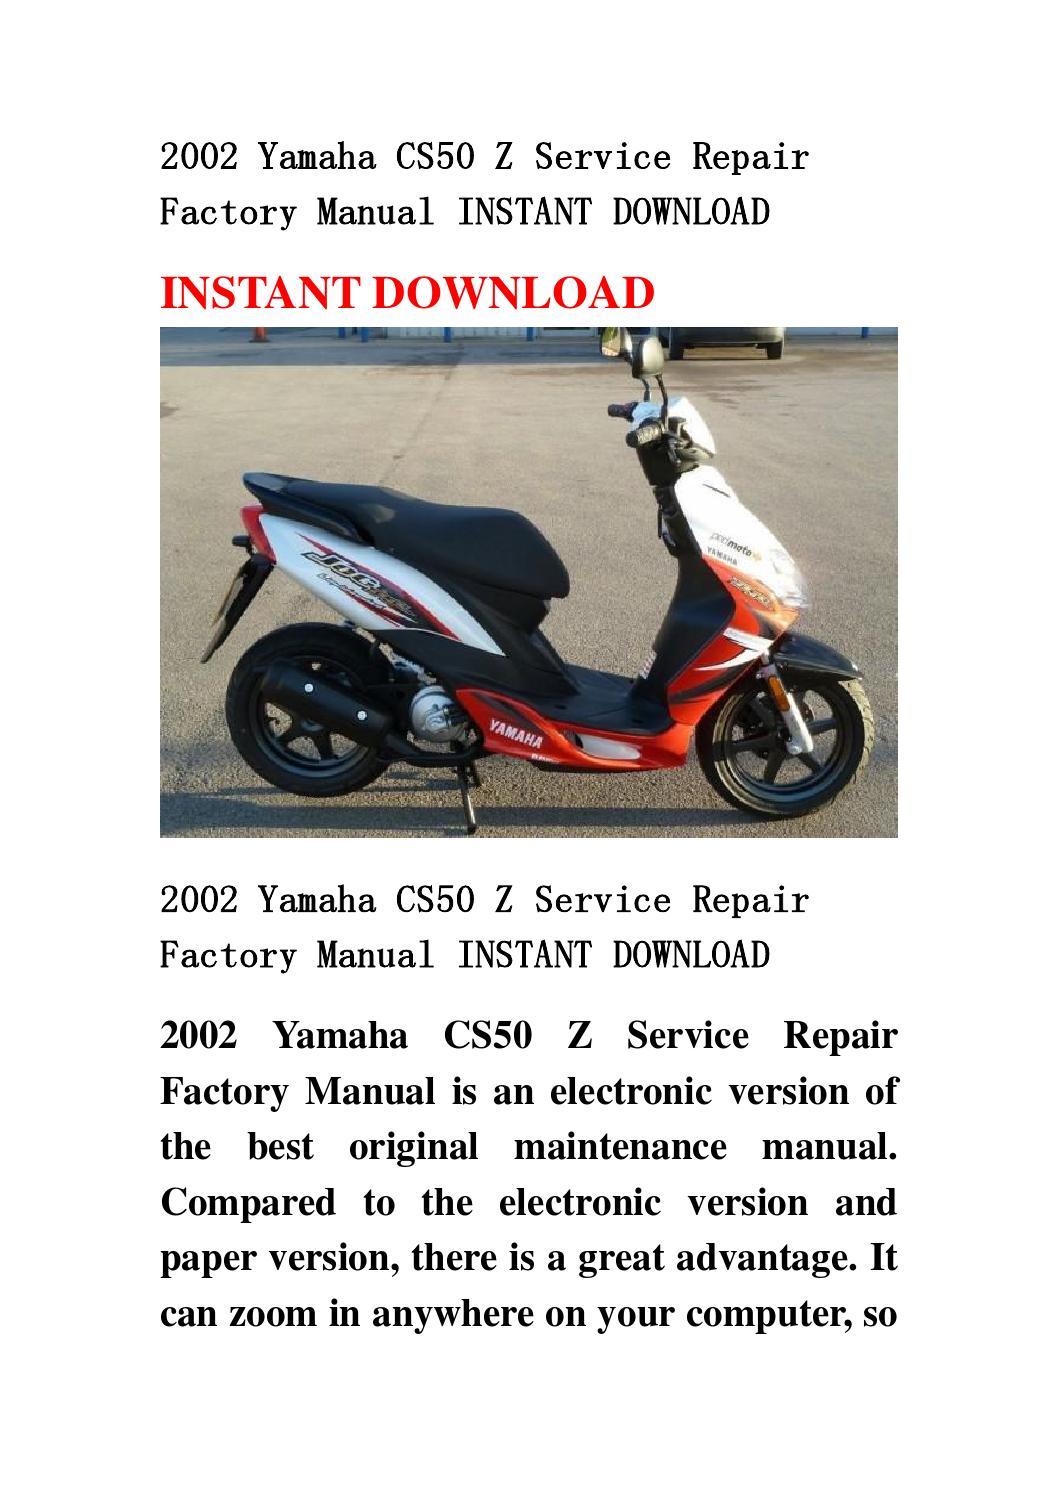 2002 Yamaha Cs50 Z Service Repair Factory Manual Instant